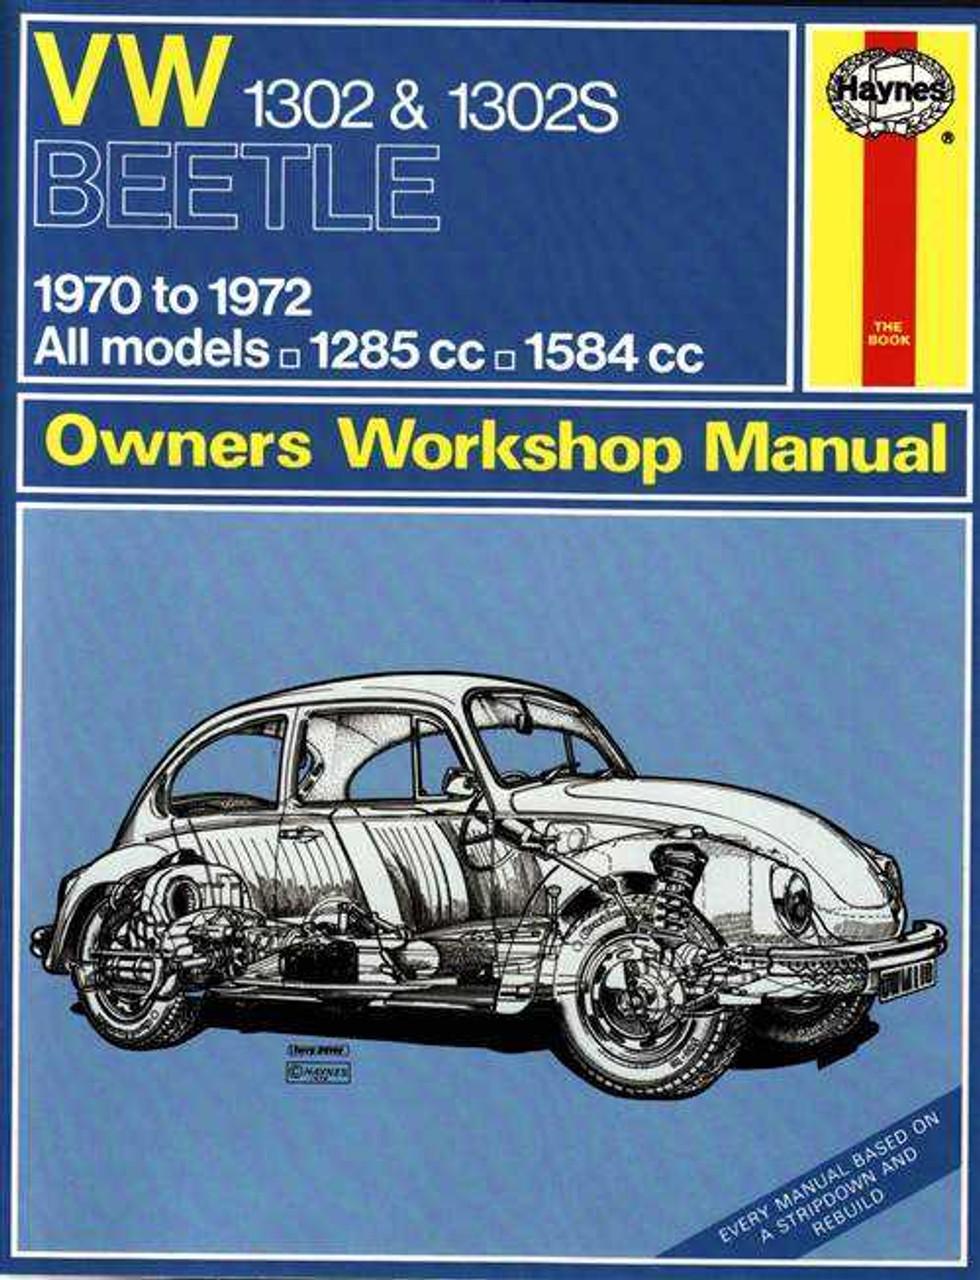 volkswagen 1302 1302s super beetle 1970 1972 workshop manual rh automotobookshop com au 1972 VW Beetle Hippy VW Beetle Repair Manual